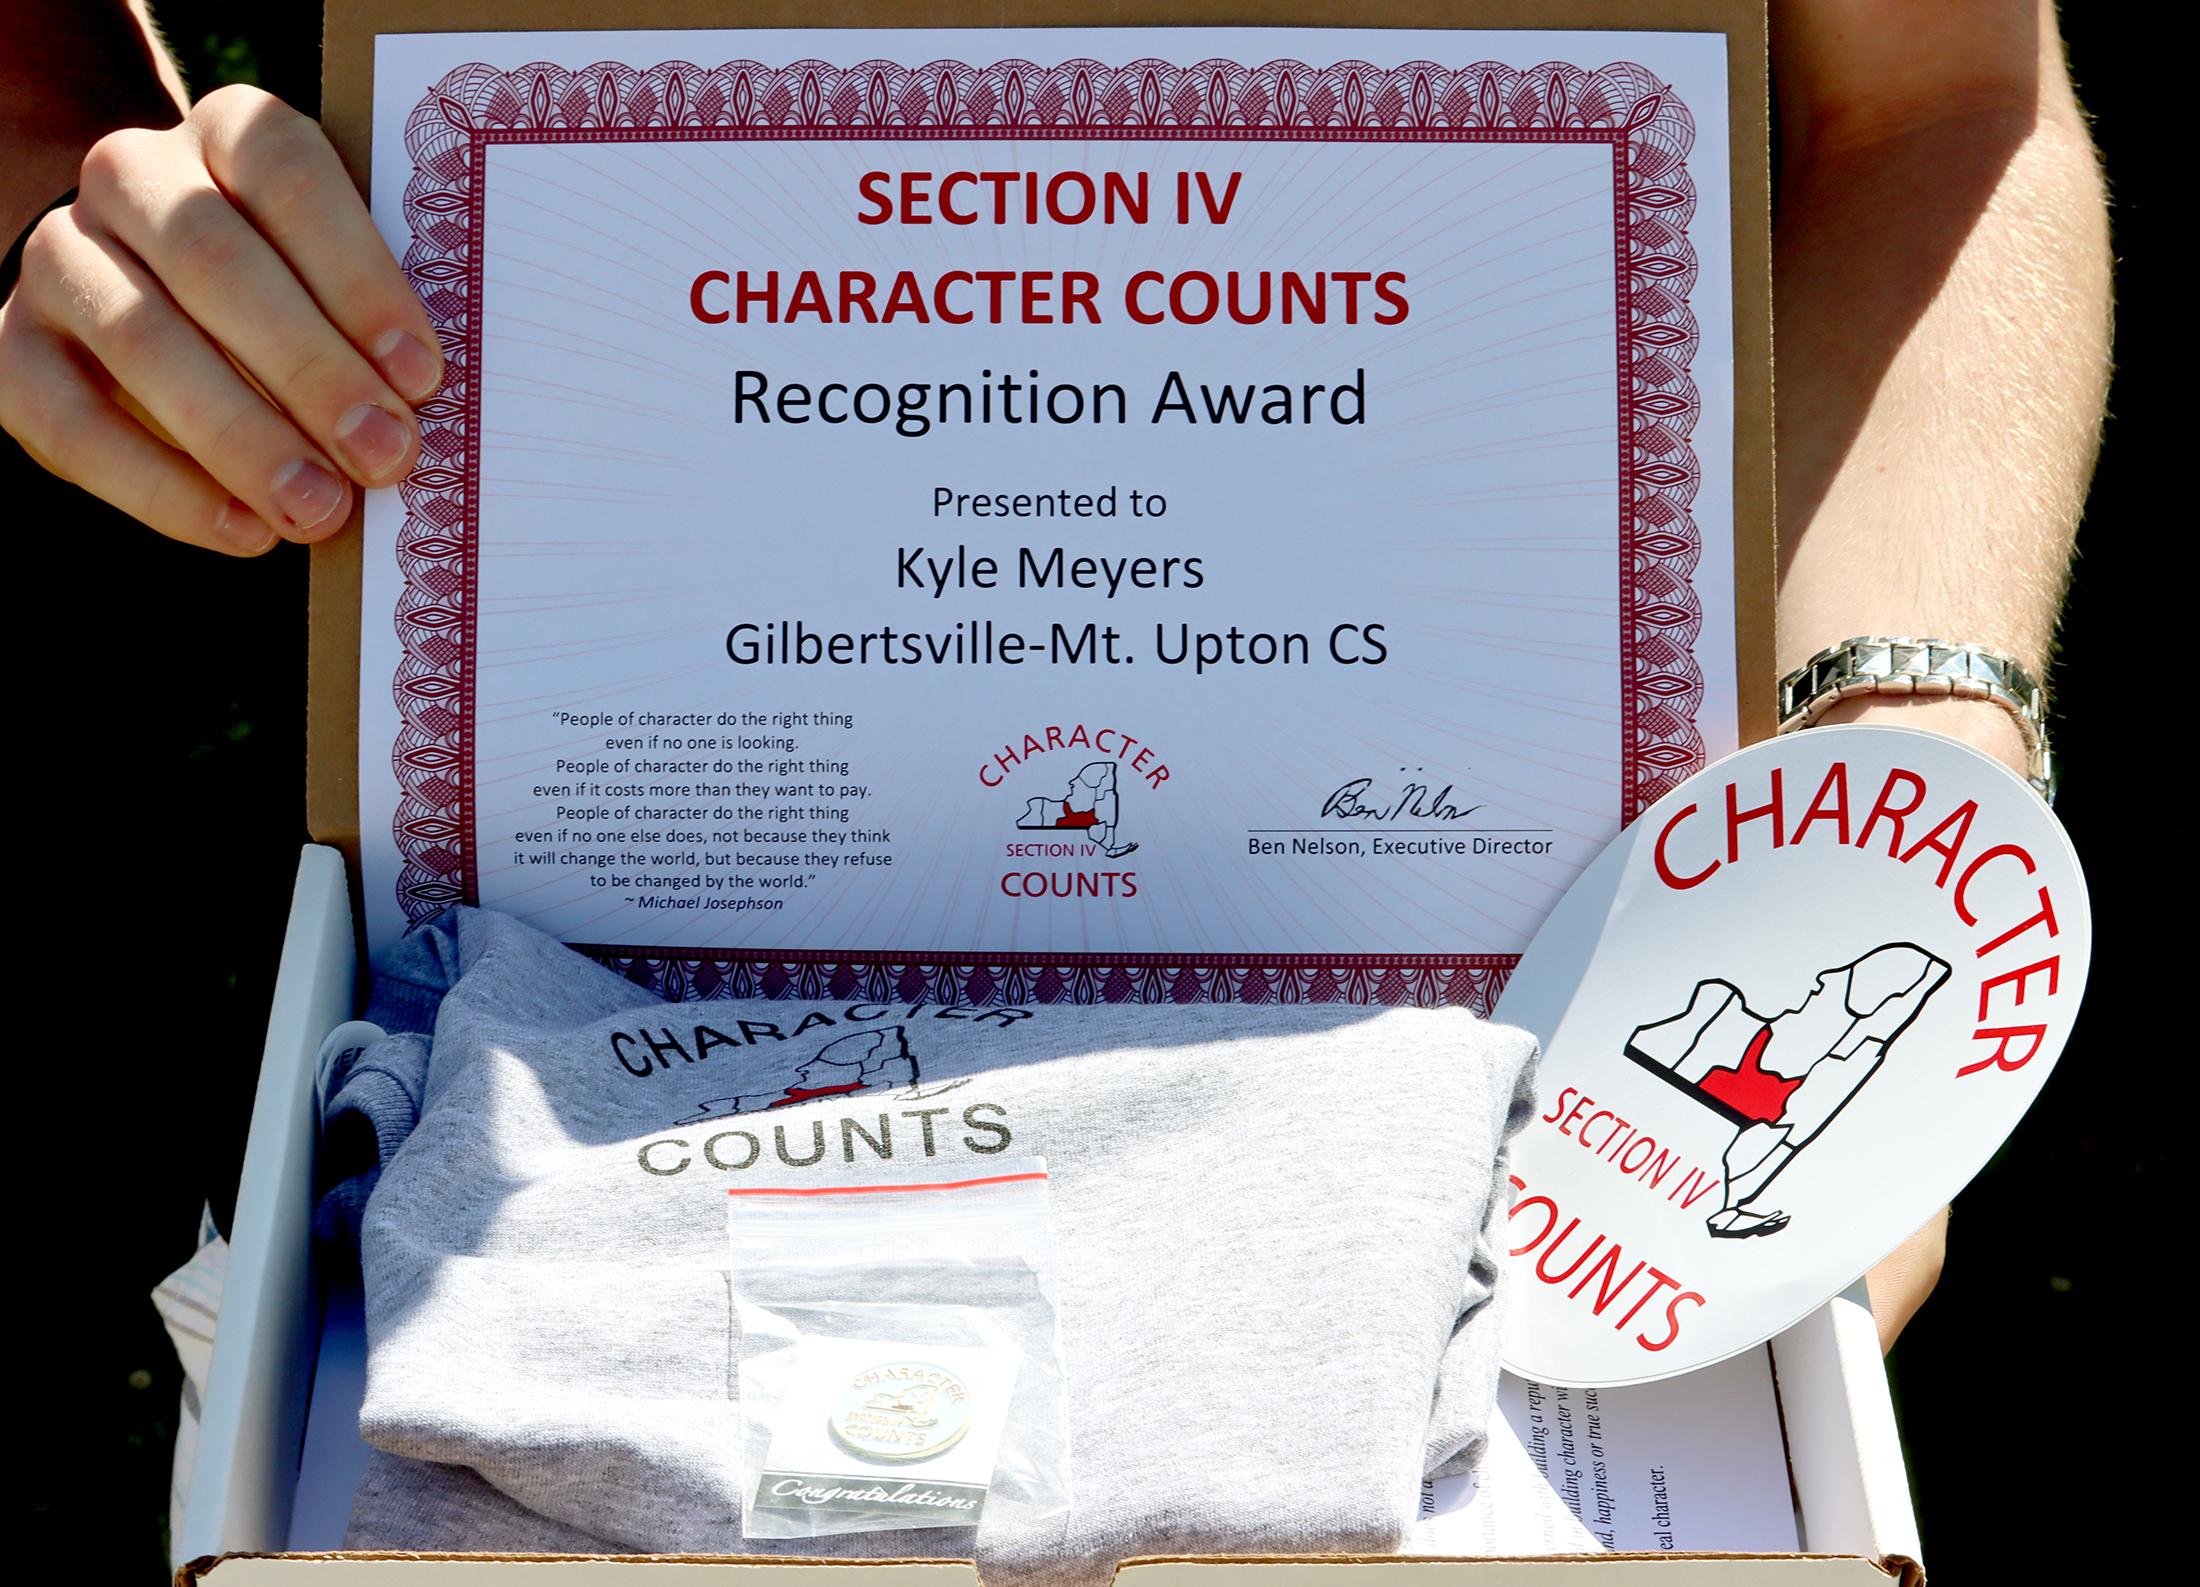 Section IV Character Counts award box (6/2021)